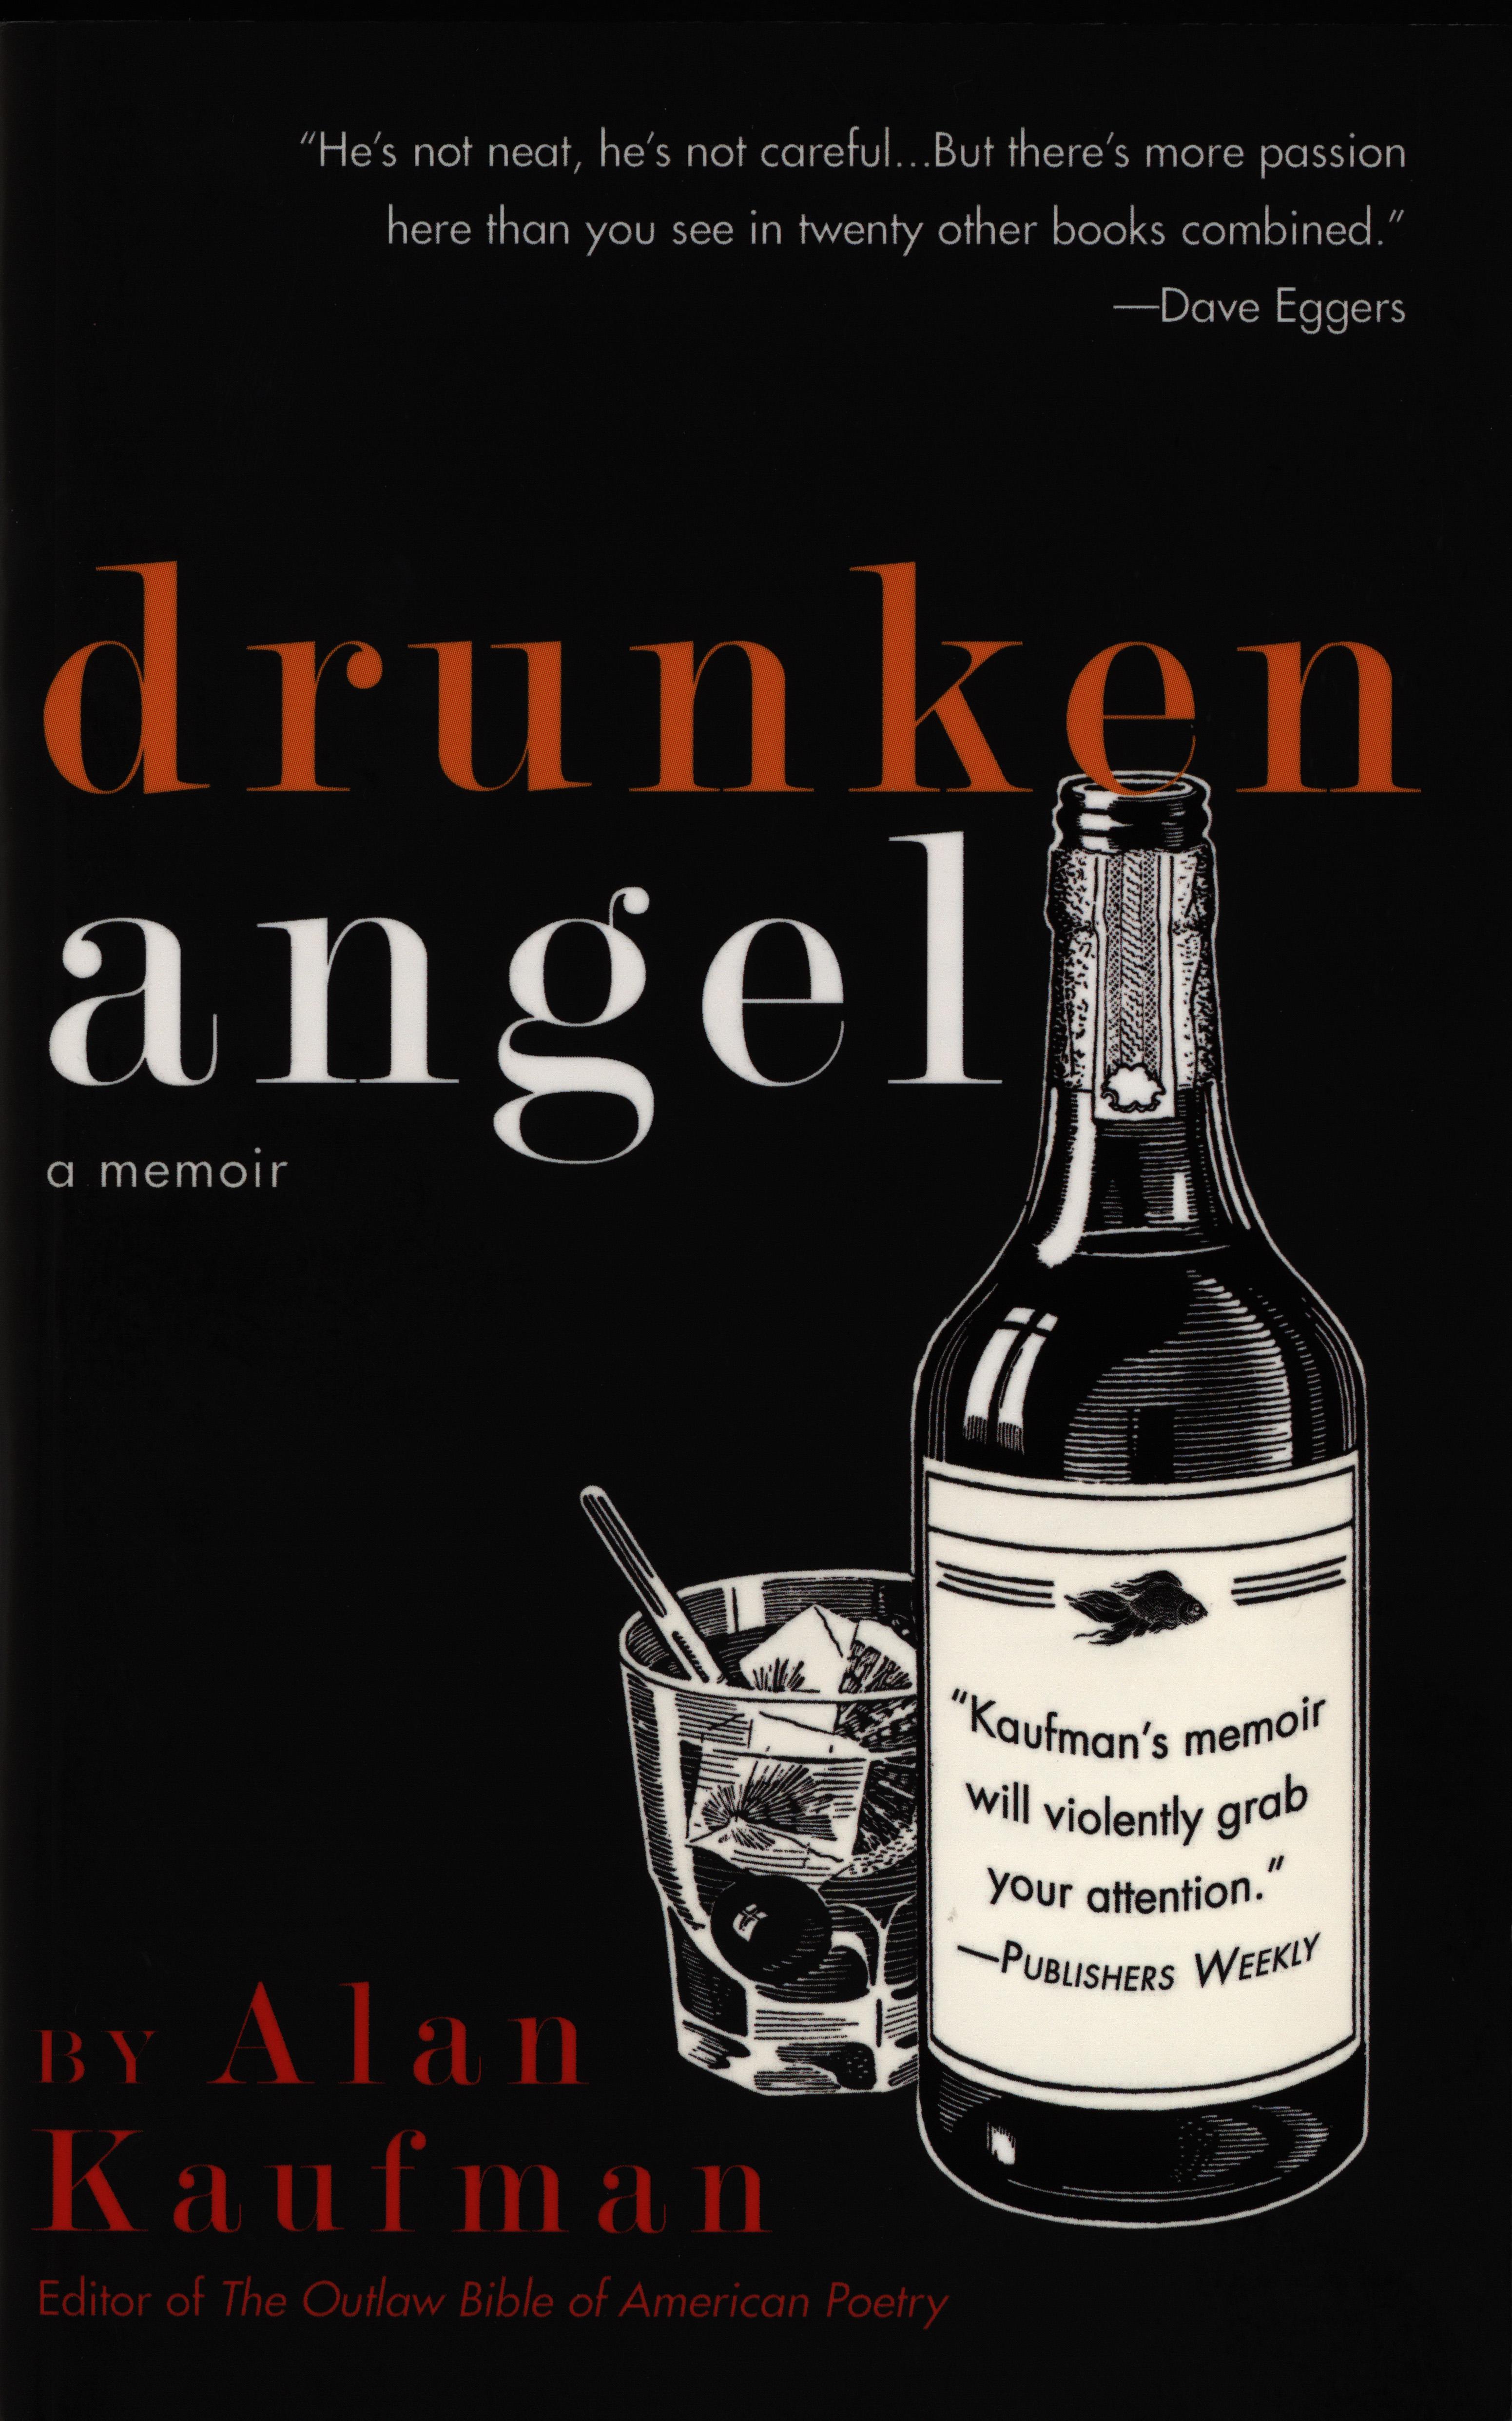 Kaufman, Alan. Drunken Angel: A Memoir. Berkeley, California: Viva Editions, 2013.